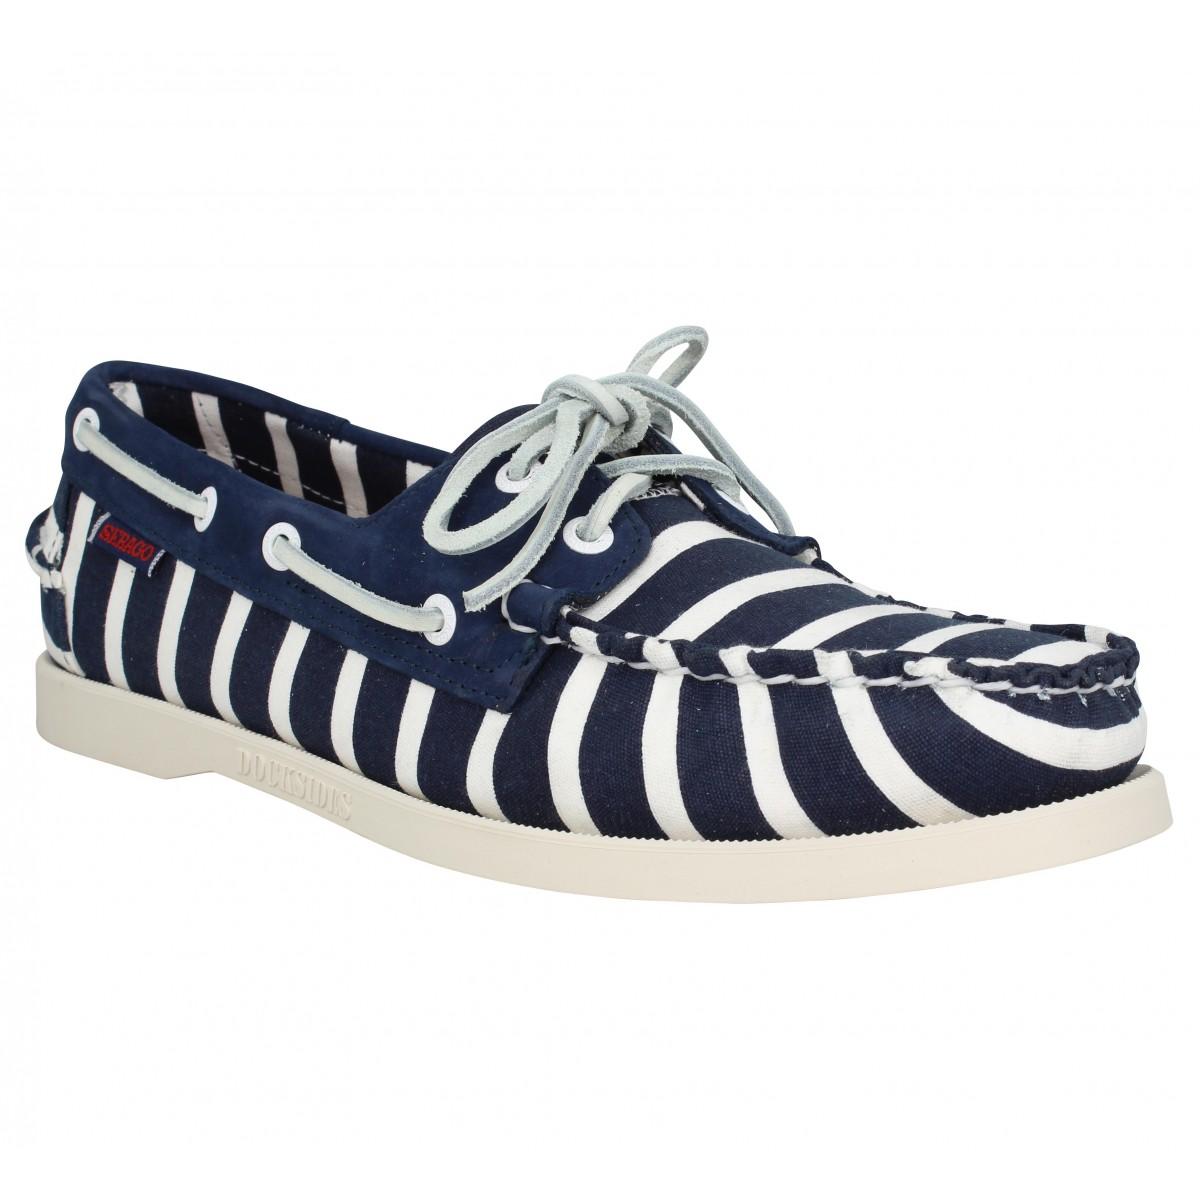 Chaussures bateaux SEBAGO X ARMOR LUX Spinnaker Stripe toile Homme Navy